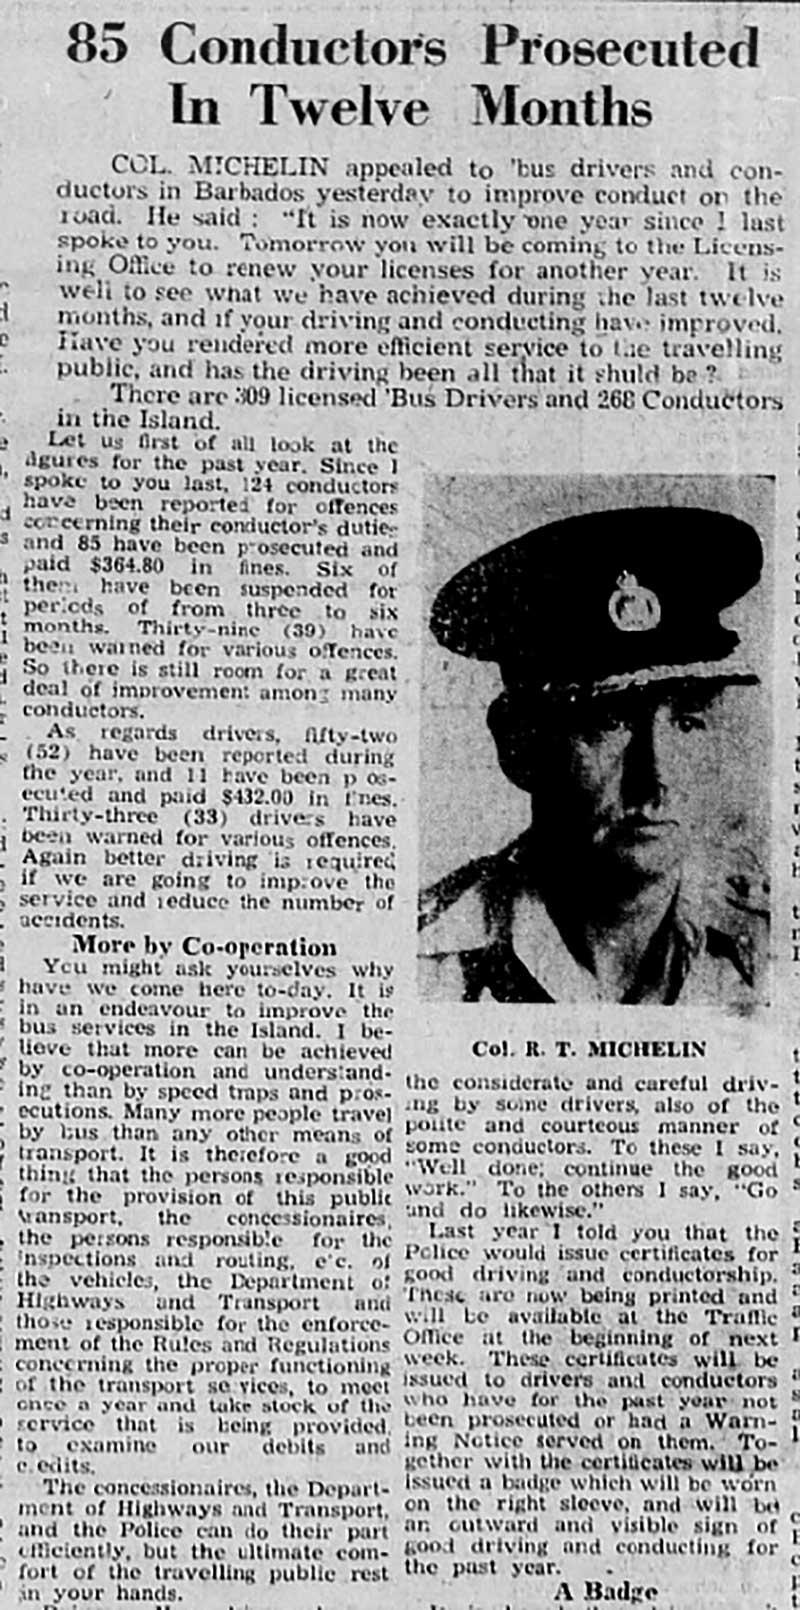 Col. Reginald Michelin, Commissioner of Police, Barbados, 1949 to 1953